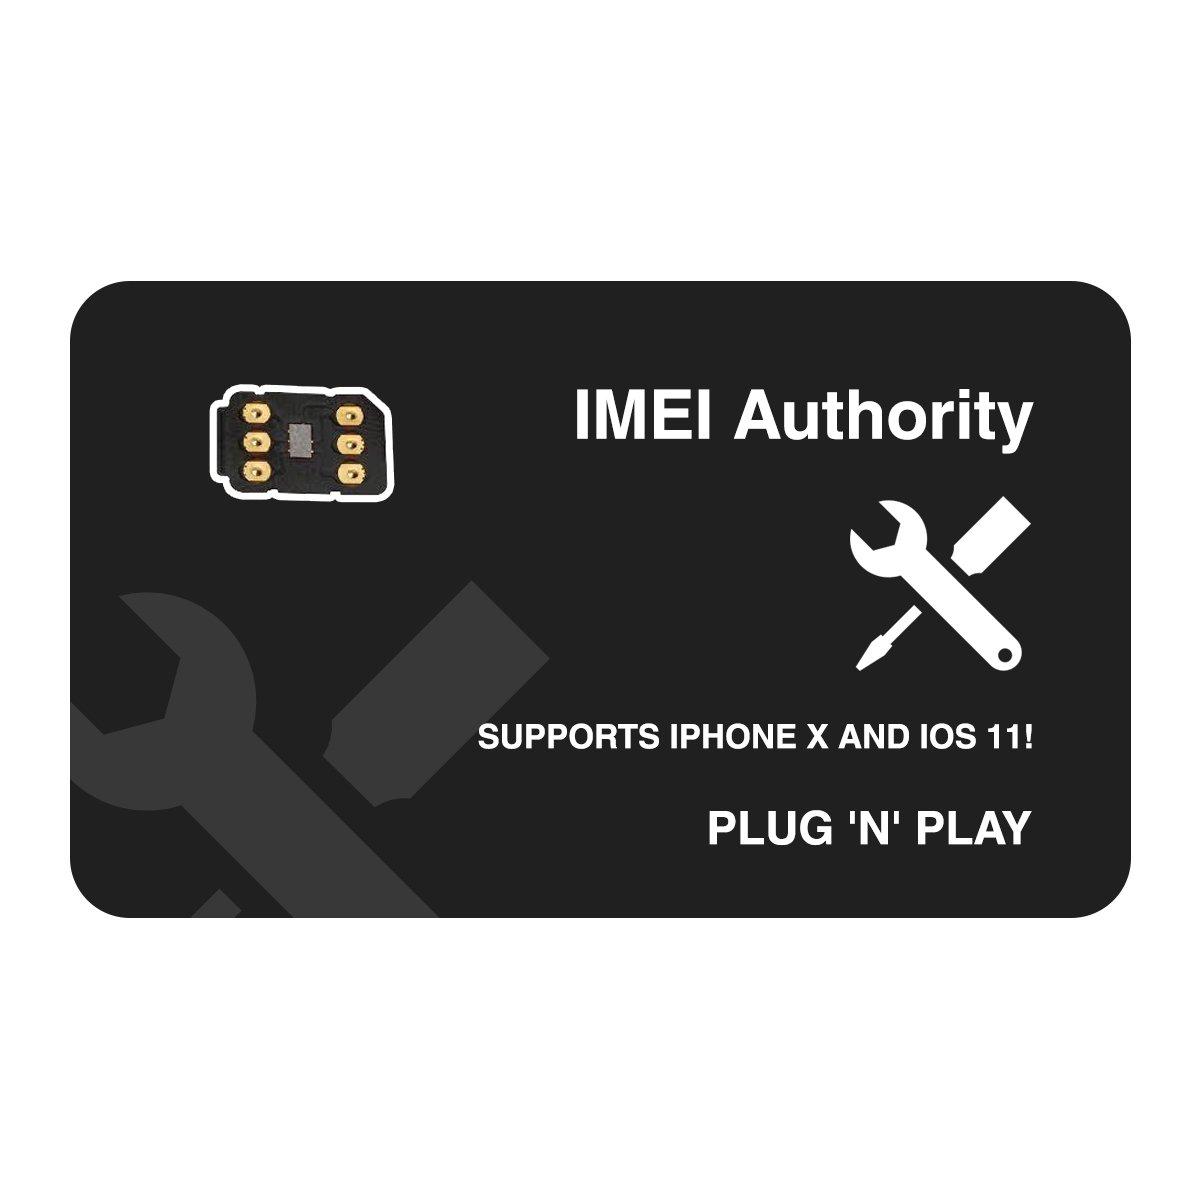 IA Sim Unlock Adapter for iPhone X 8+ 8 7+ 7 6S+ 6S 6 5C 5S - Any Carrier - AT&T, Verizon, Sprint, T-Mobile, XFINITY, GSM or CDMA GPP TURBO GEVEY AIR R SIM …